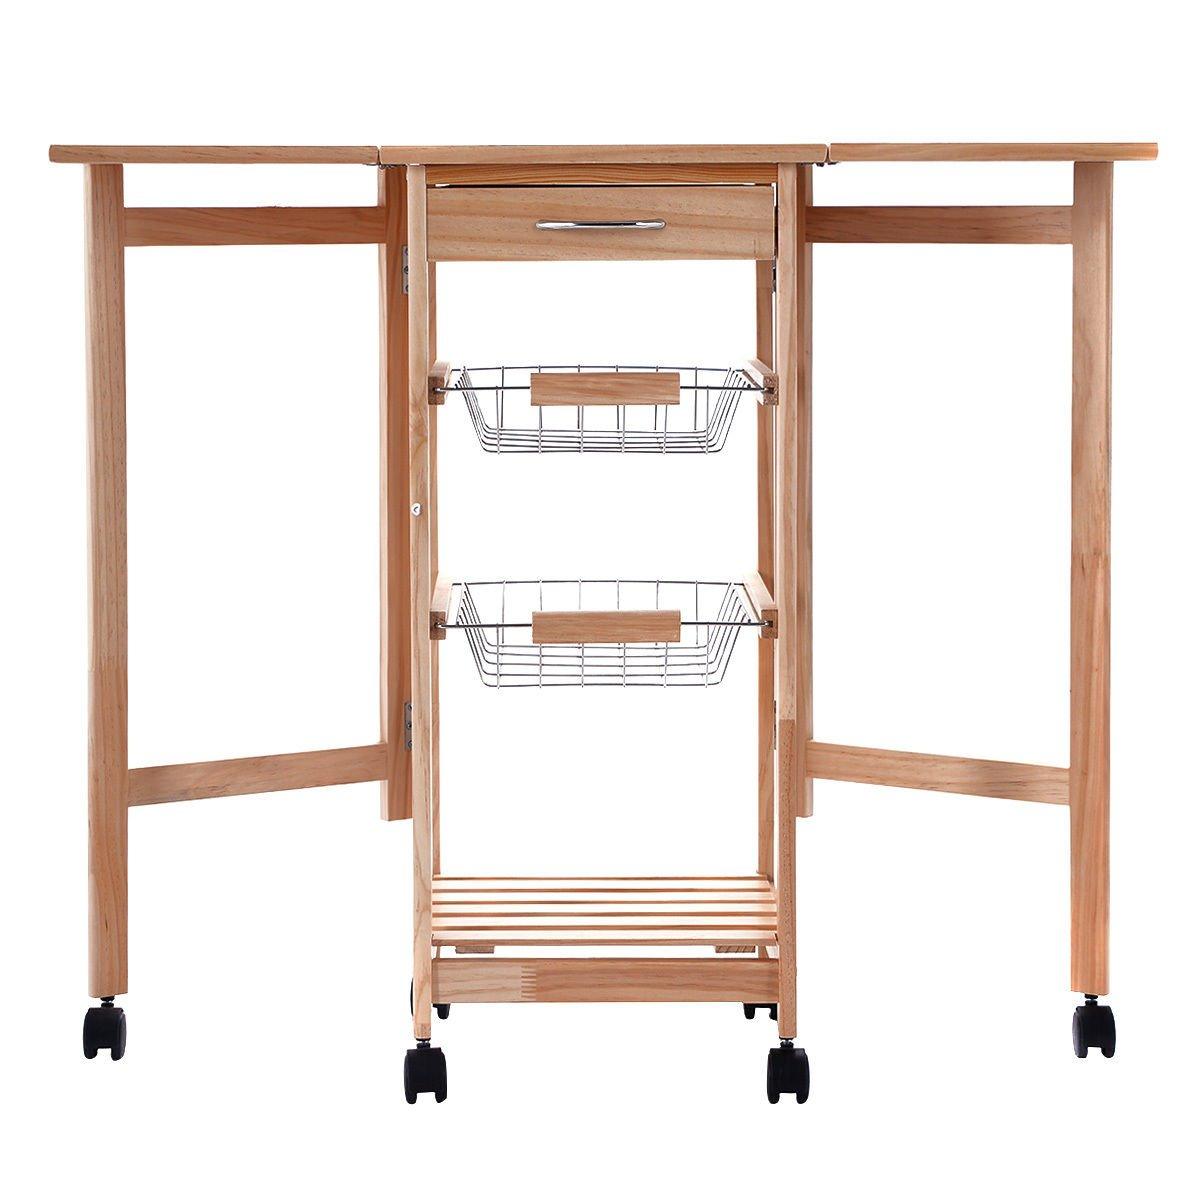 PROSPERLY U.S.Product Portable Rolling Wood Kitchen Trolley Cart Drop Leaf Storage Drawers Rack Basket by Prosperly (Image #3)